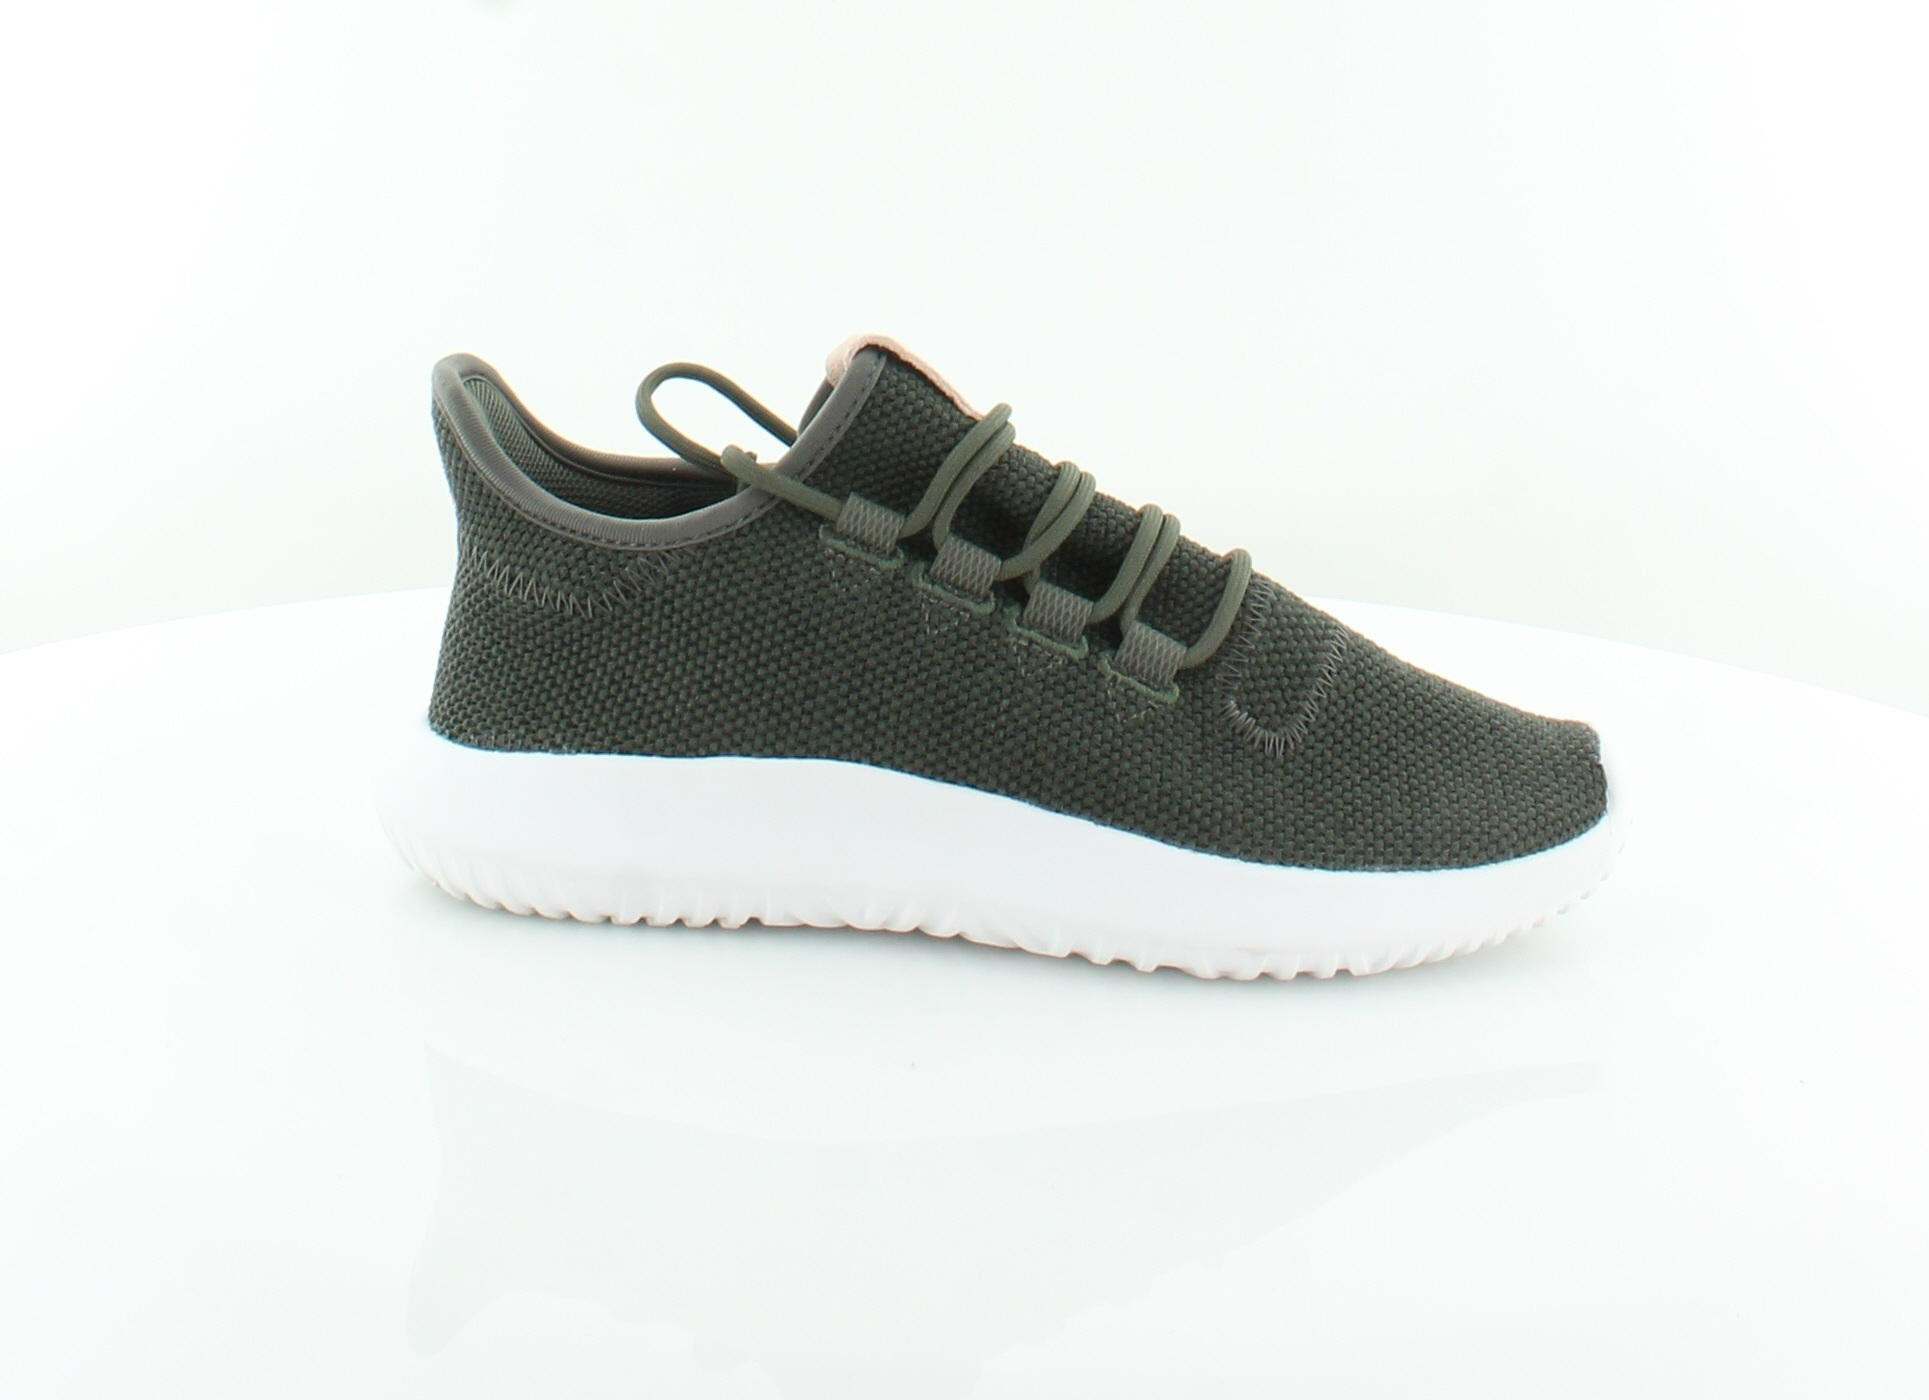 on sale 14fa7 51dde Image is loading Adidas-Tubular-Shadow-Green-Womens-Shoes-Size-7-